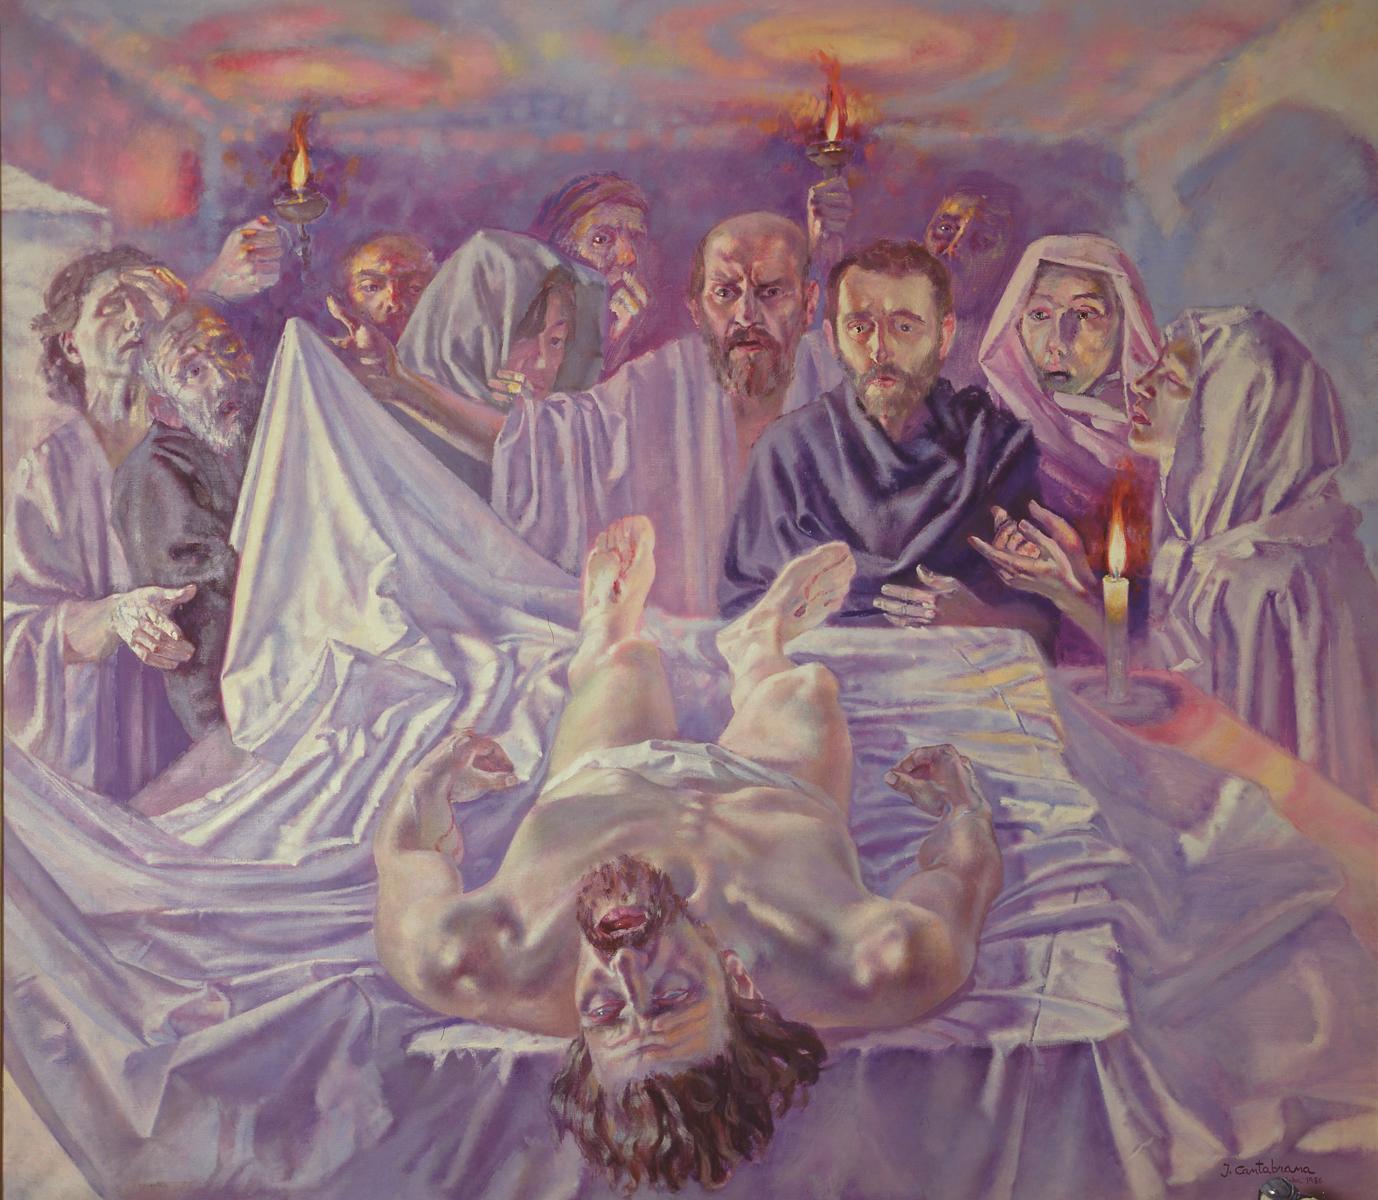 Cristo-yacente--oleo-sobre-lienzo-160x180-cm